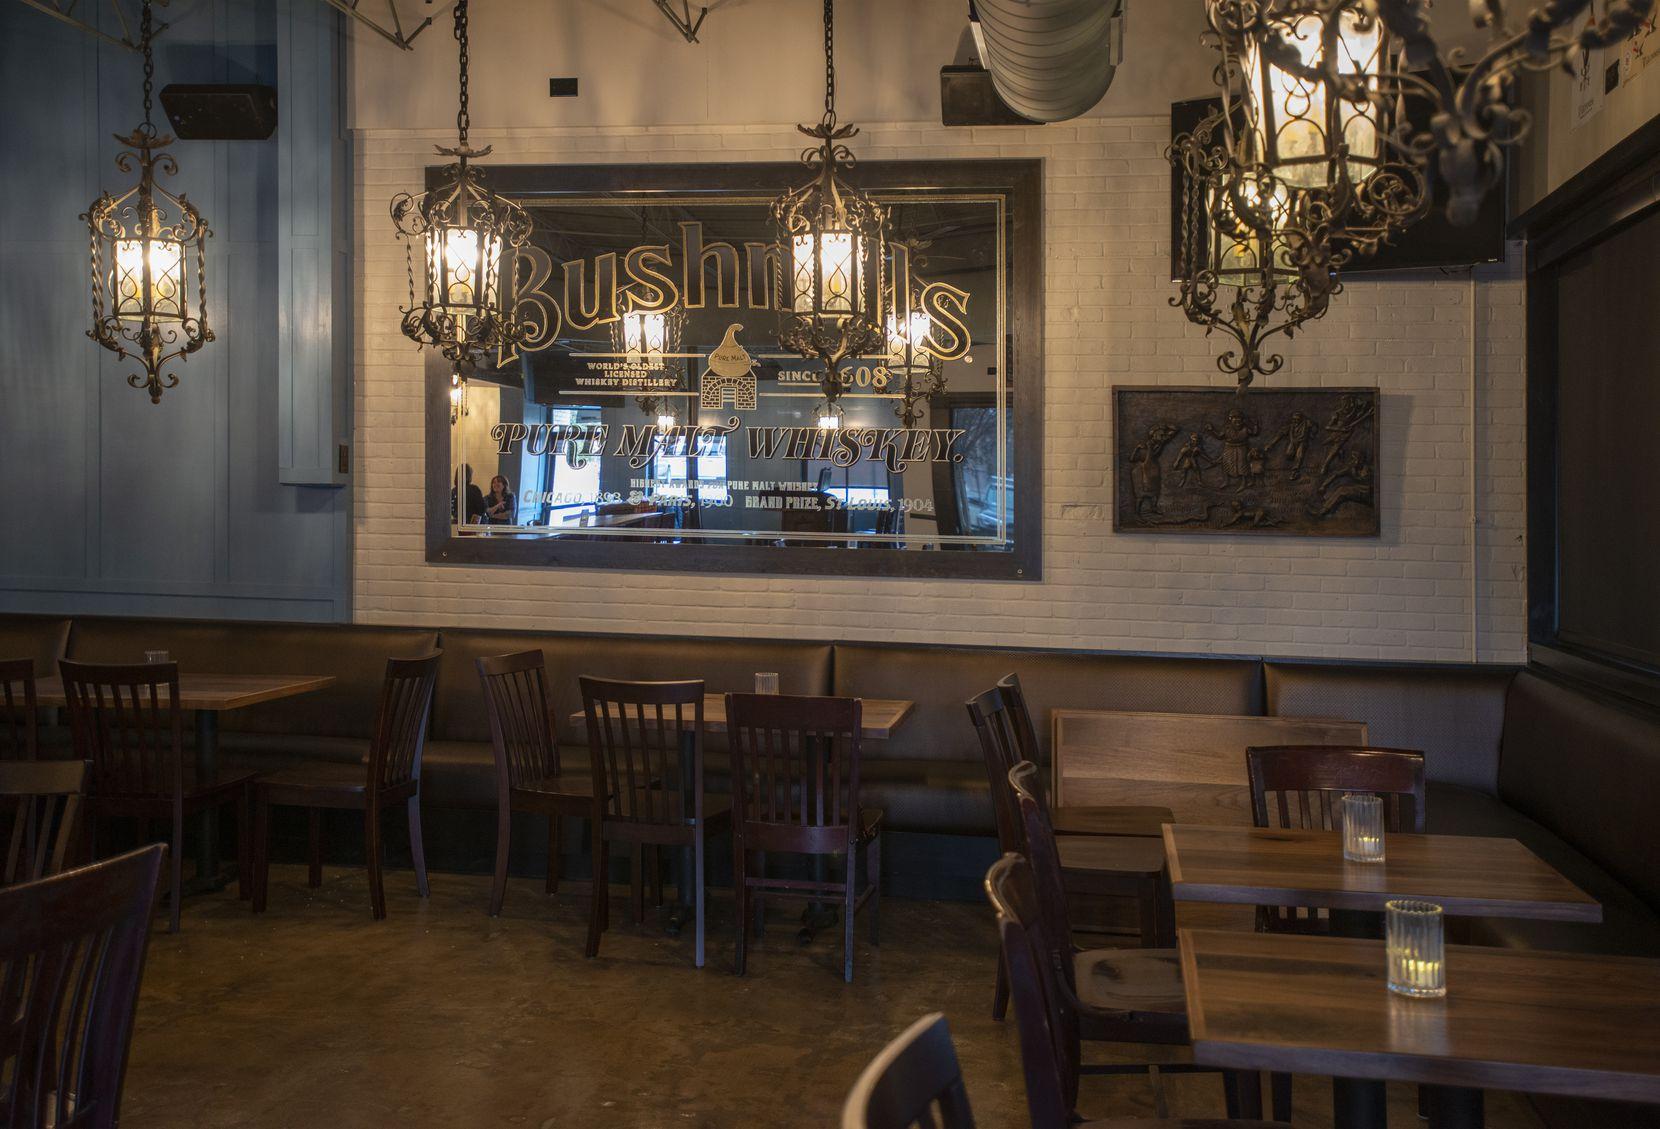 Lochland's has a cozy, dimly-lit interior.